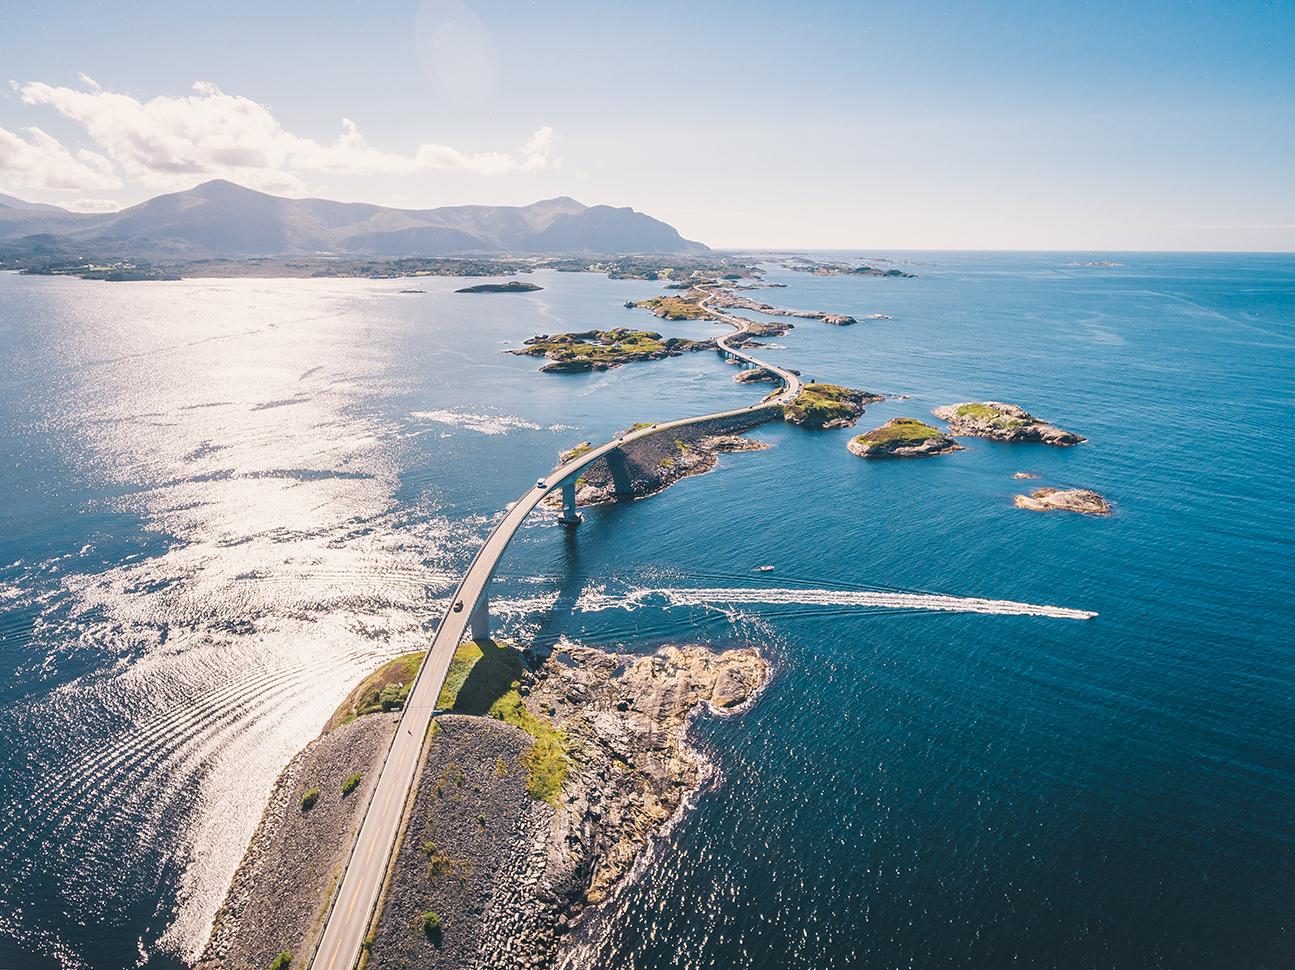 beautiful bridges crossing the Norway archipelagos